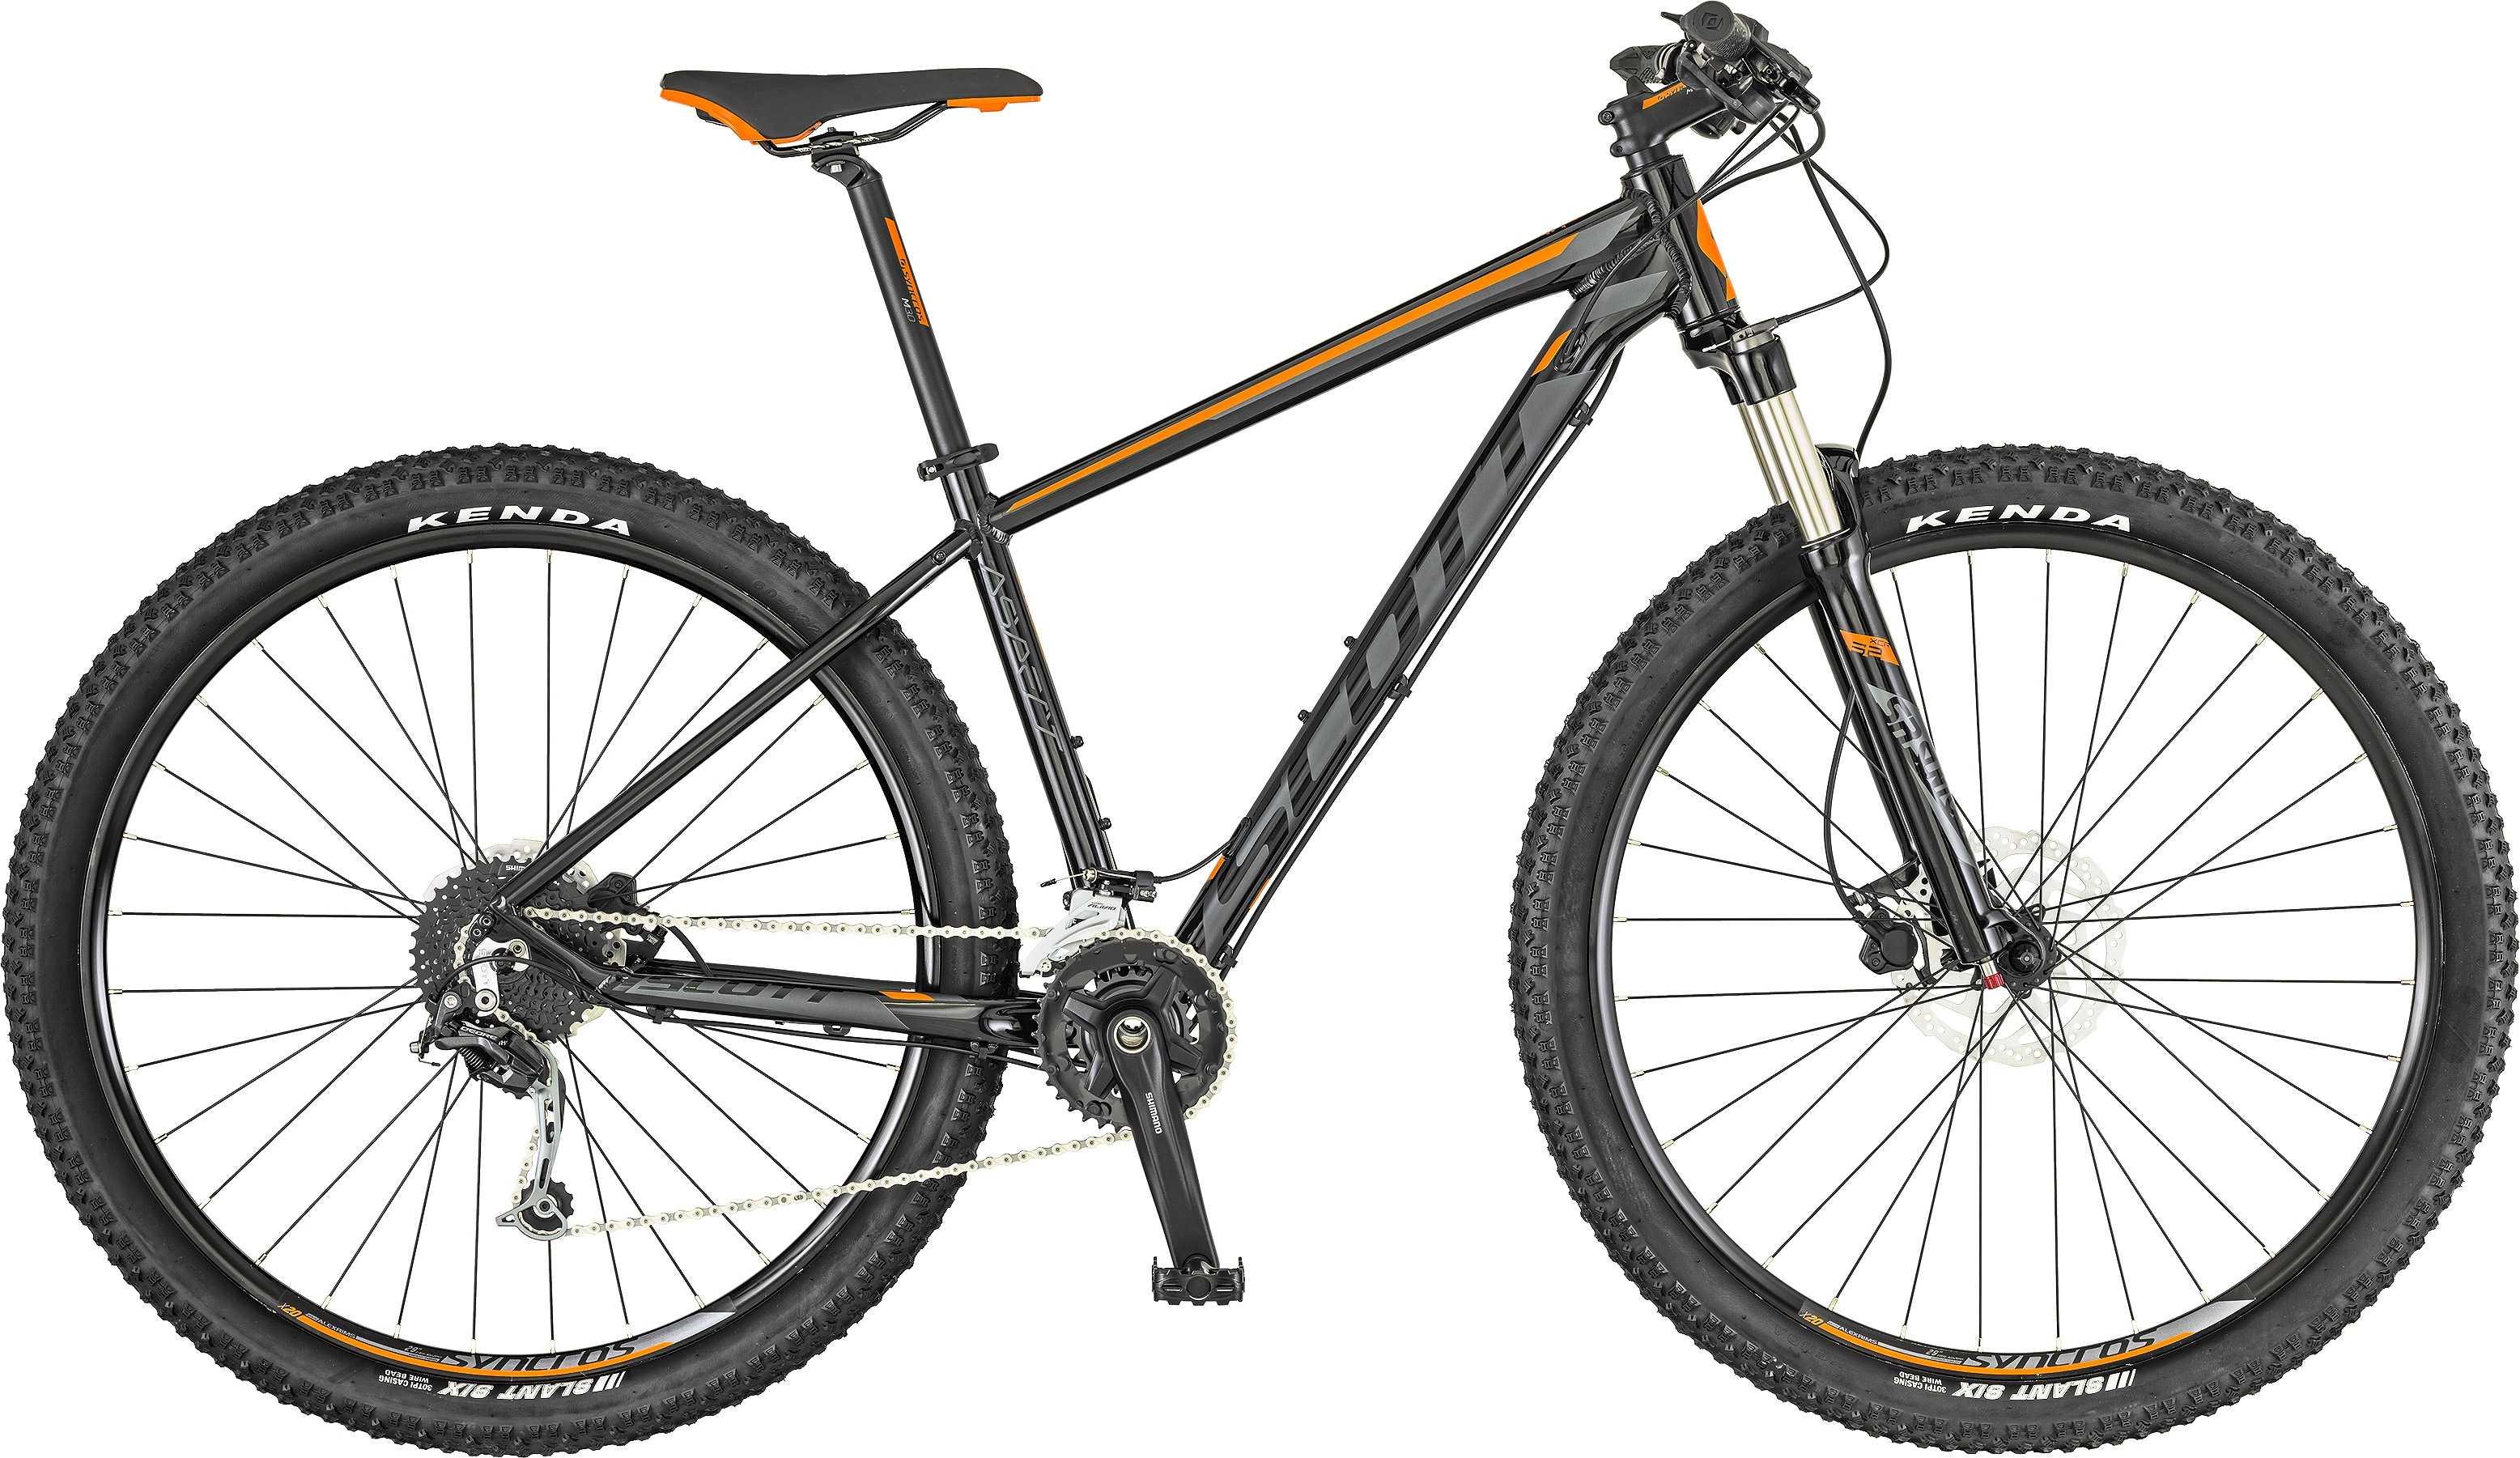 Scott Aspect 930 svart/orange medium